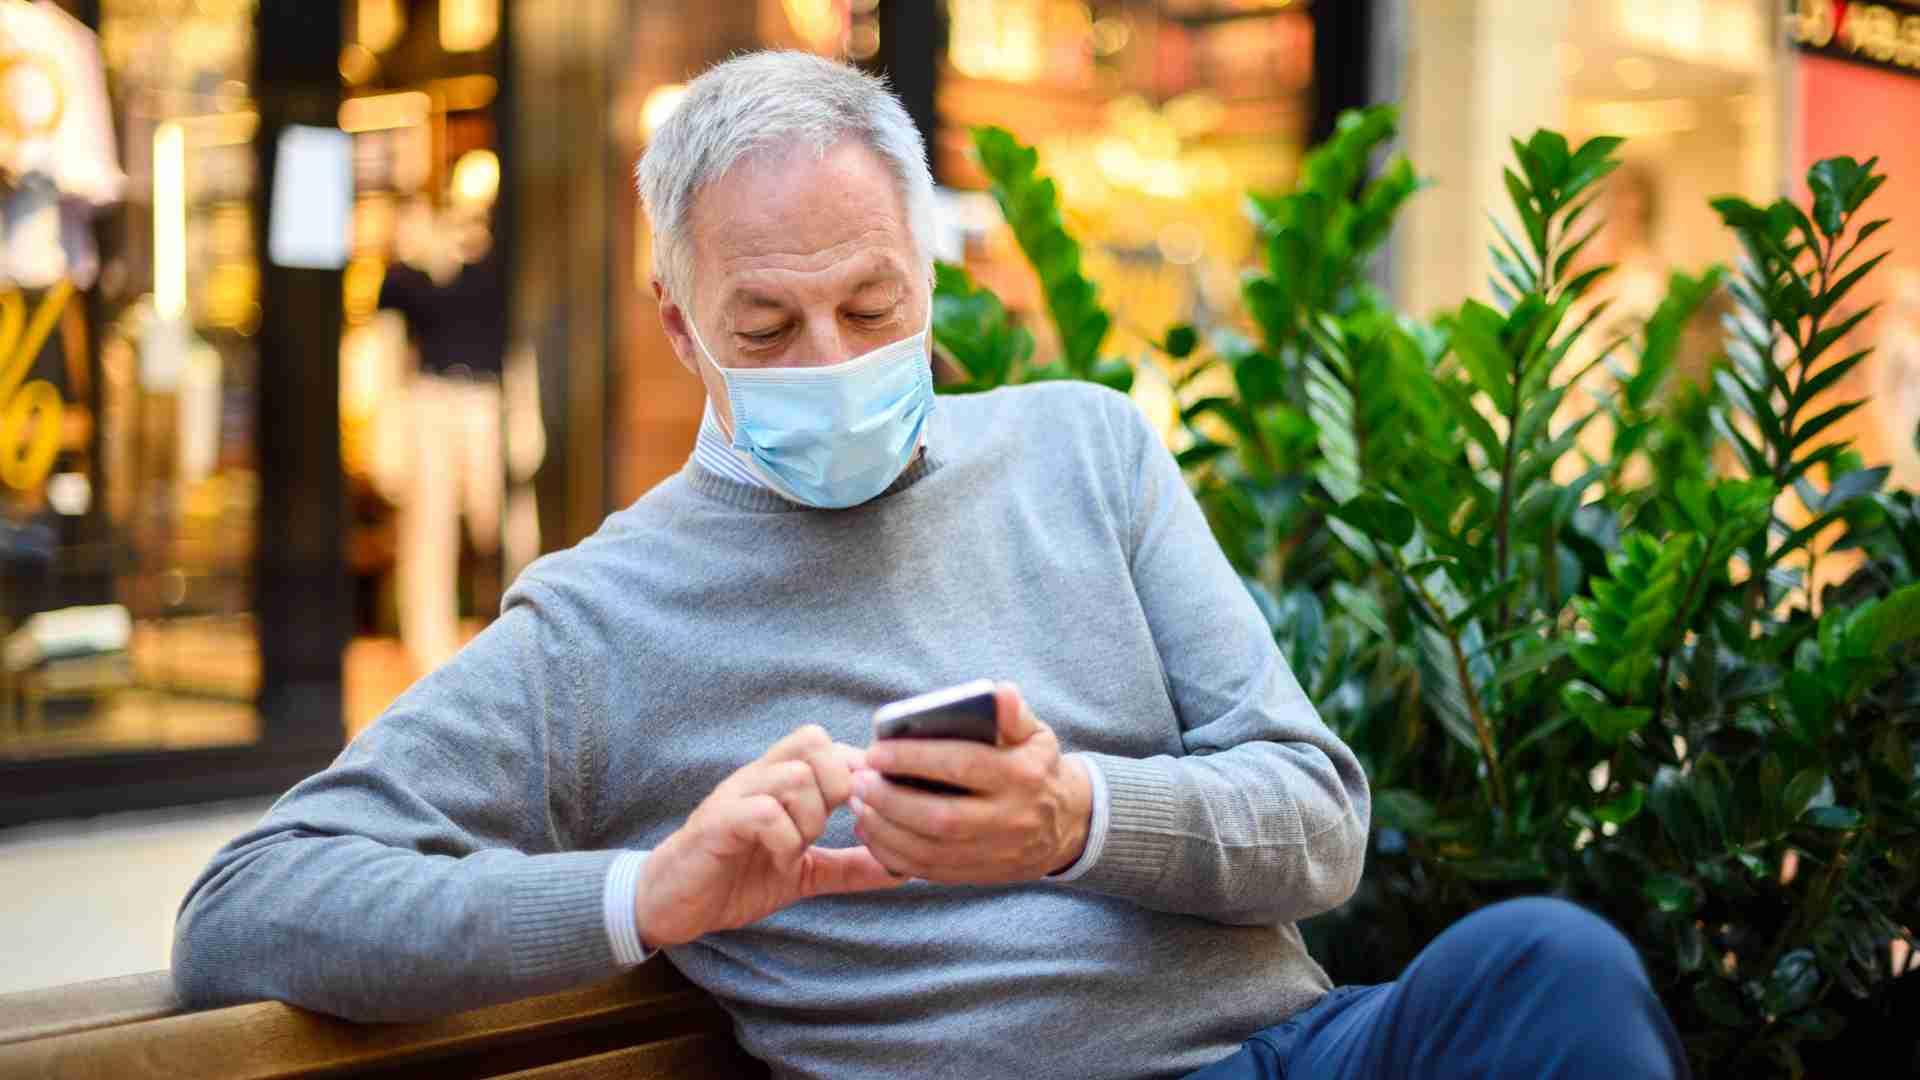 Senior Man sitting bench using-smartphone mall wearing Covid mask